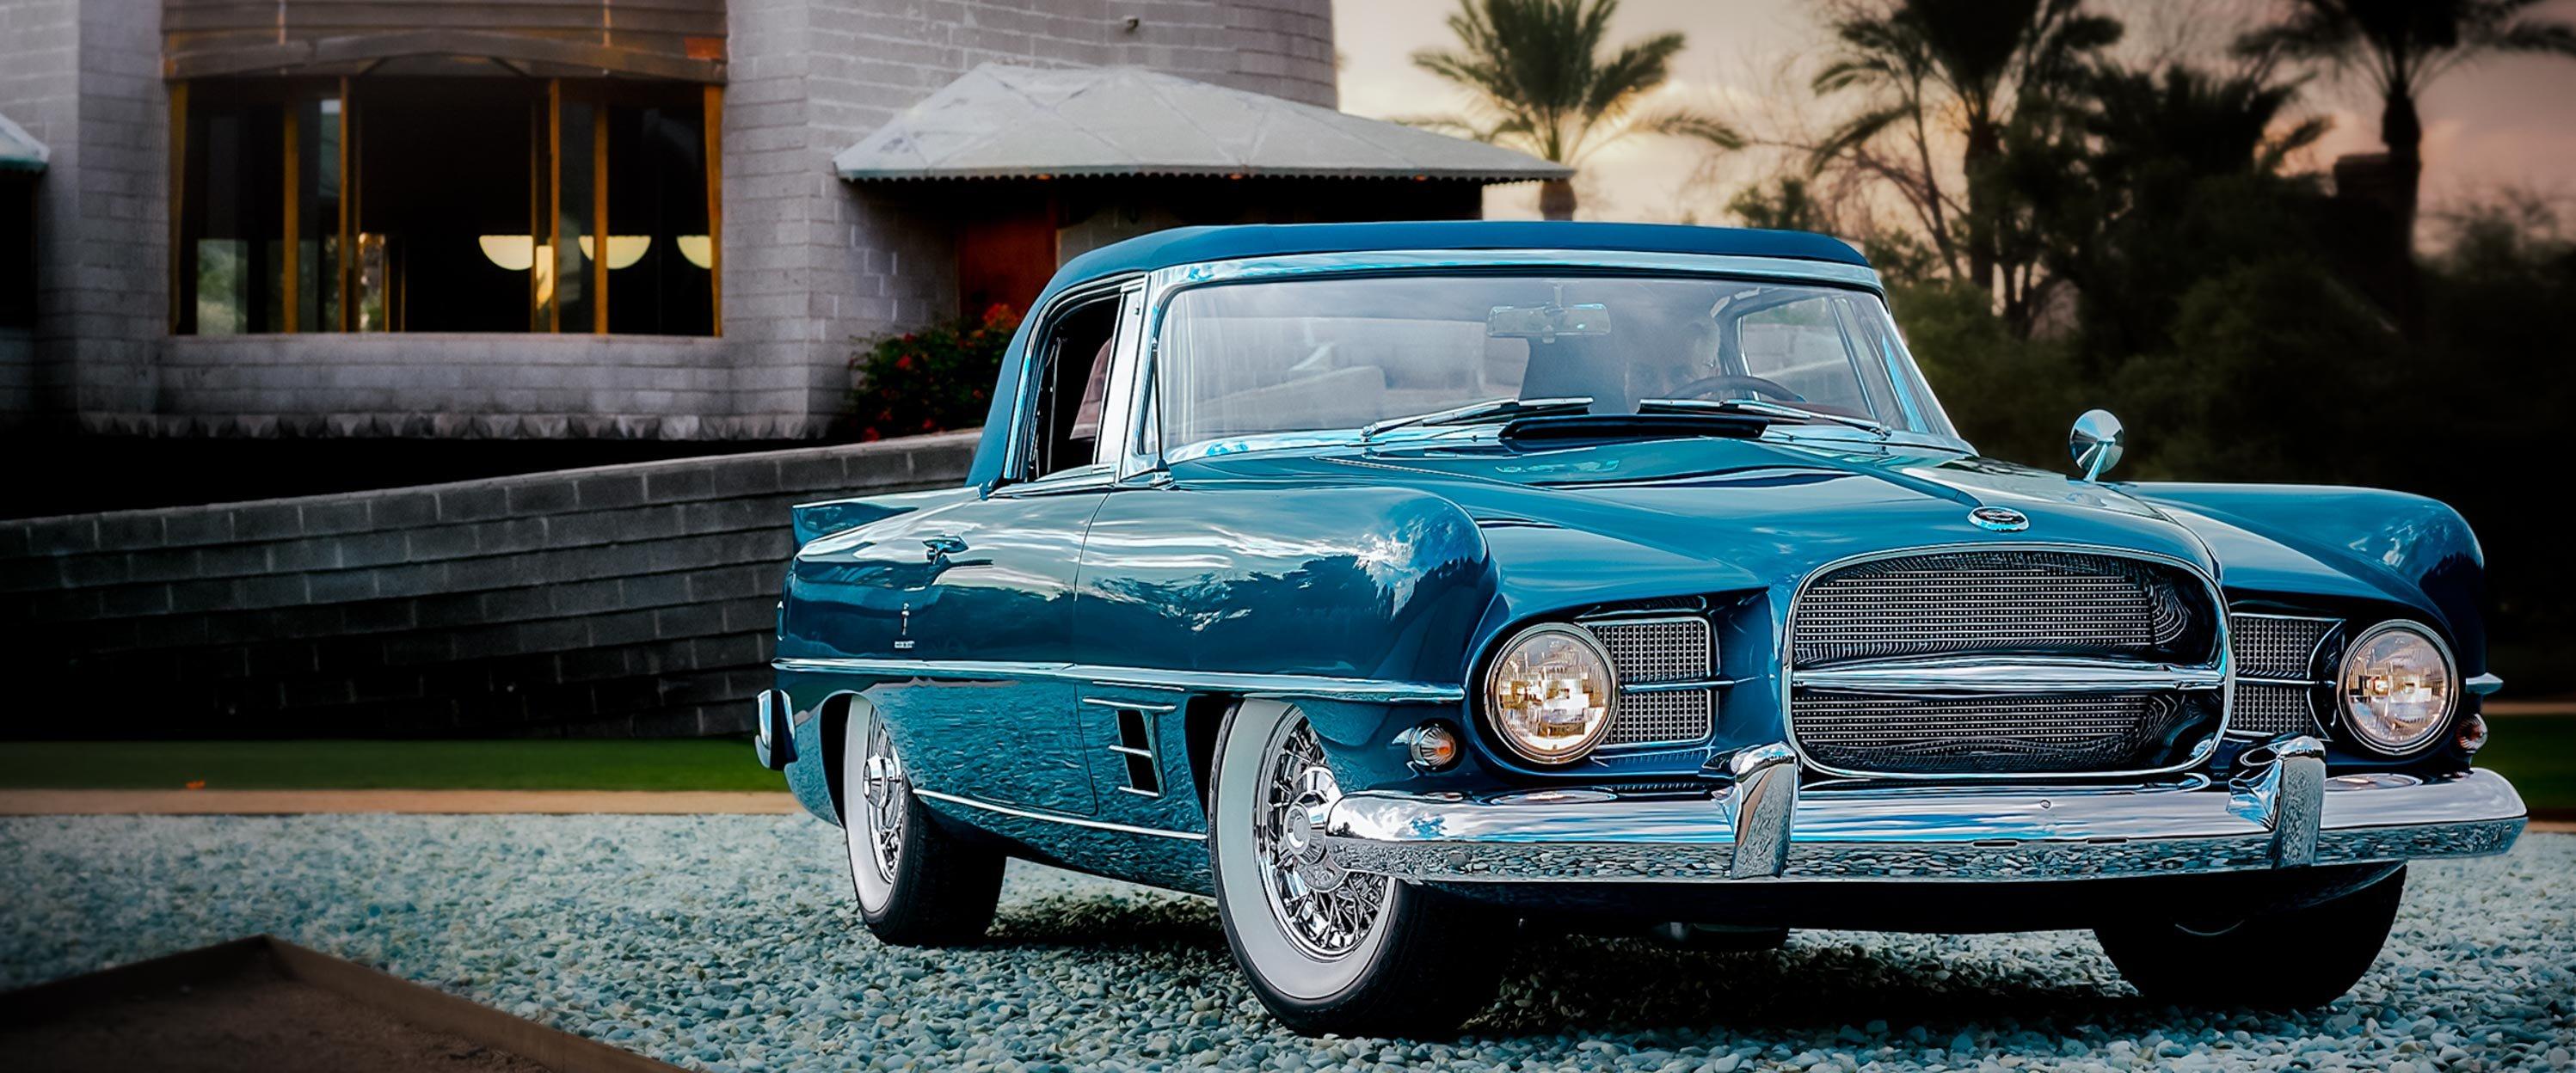 1957 Dual Ghia - Farland Classic Restoration